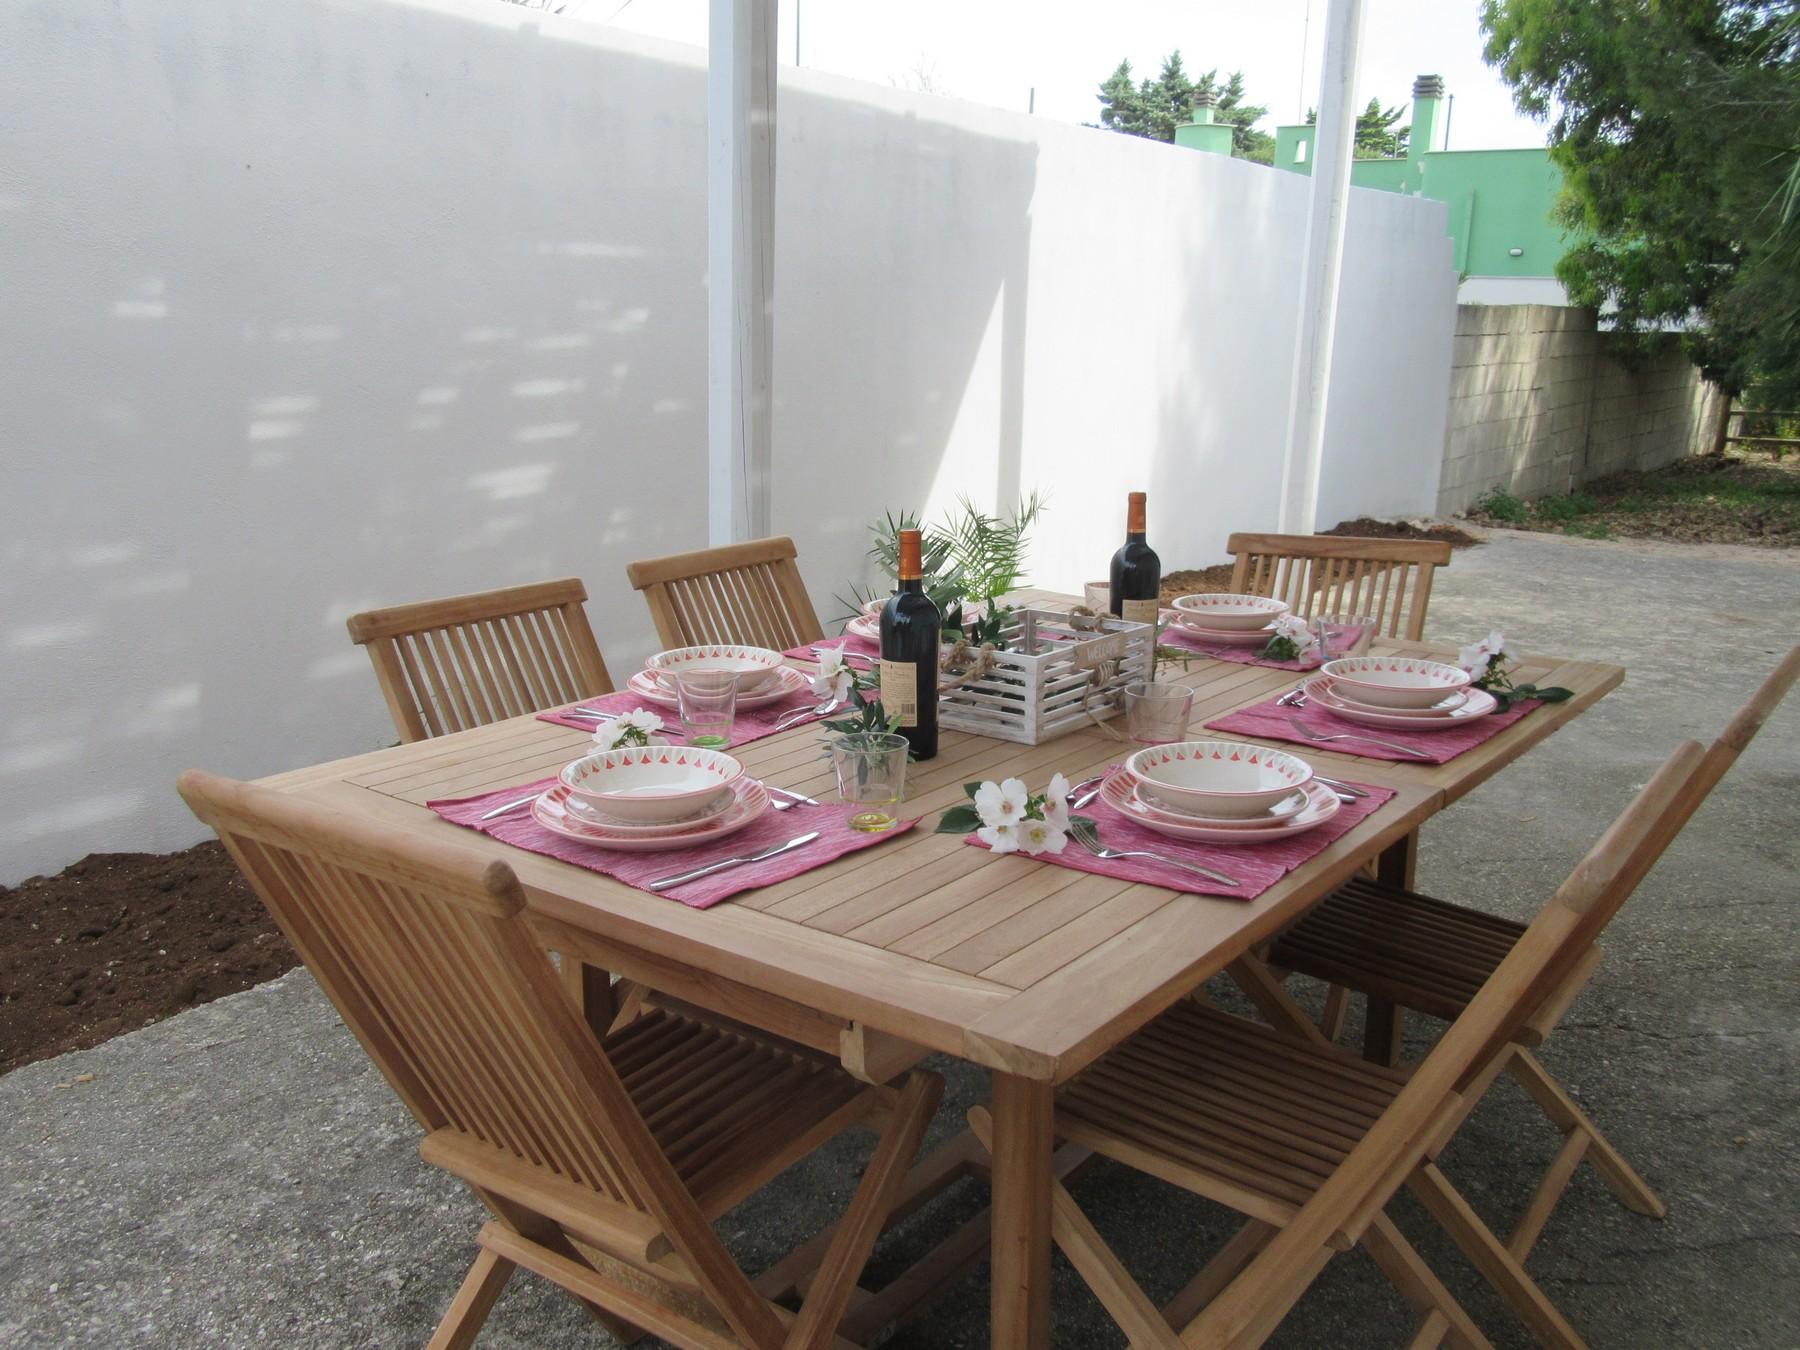 Ferienhaus Villa Mariposa n°3, only 200 meters from the beach (2354067), Porto Cesareo, Lecce, Apulien, Italien, Bild 17